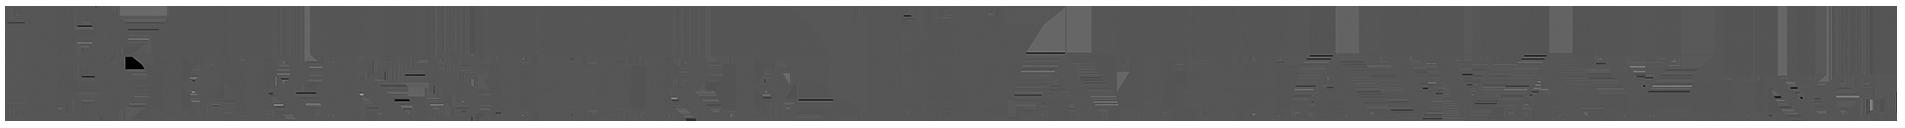 Berkshire-Hathaway-Logo-2